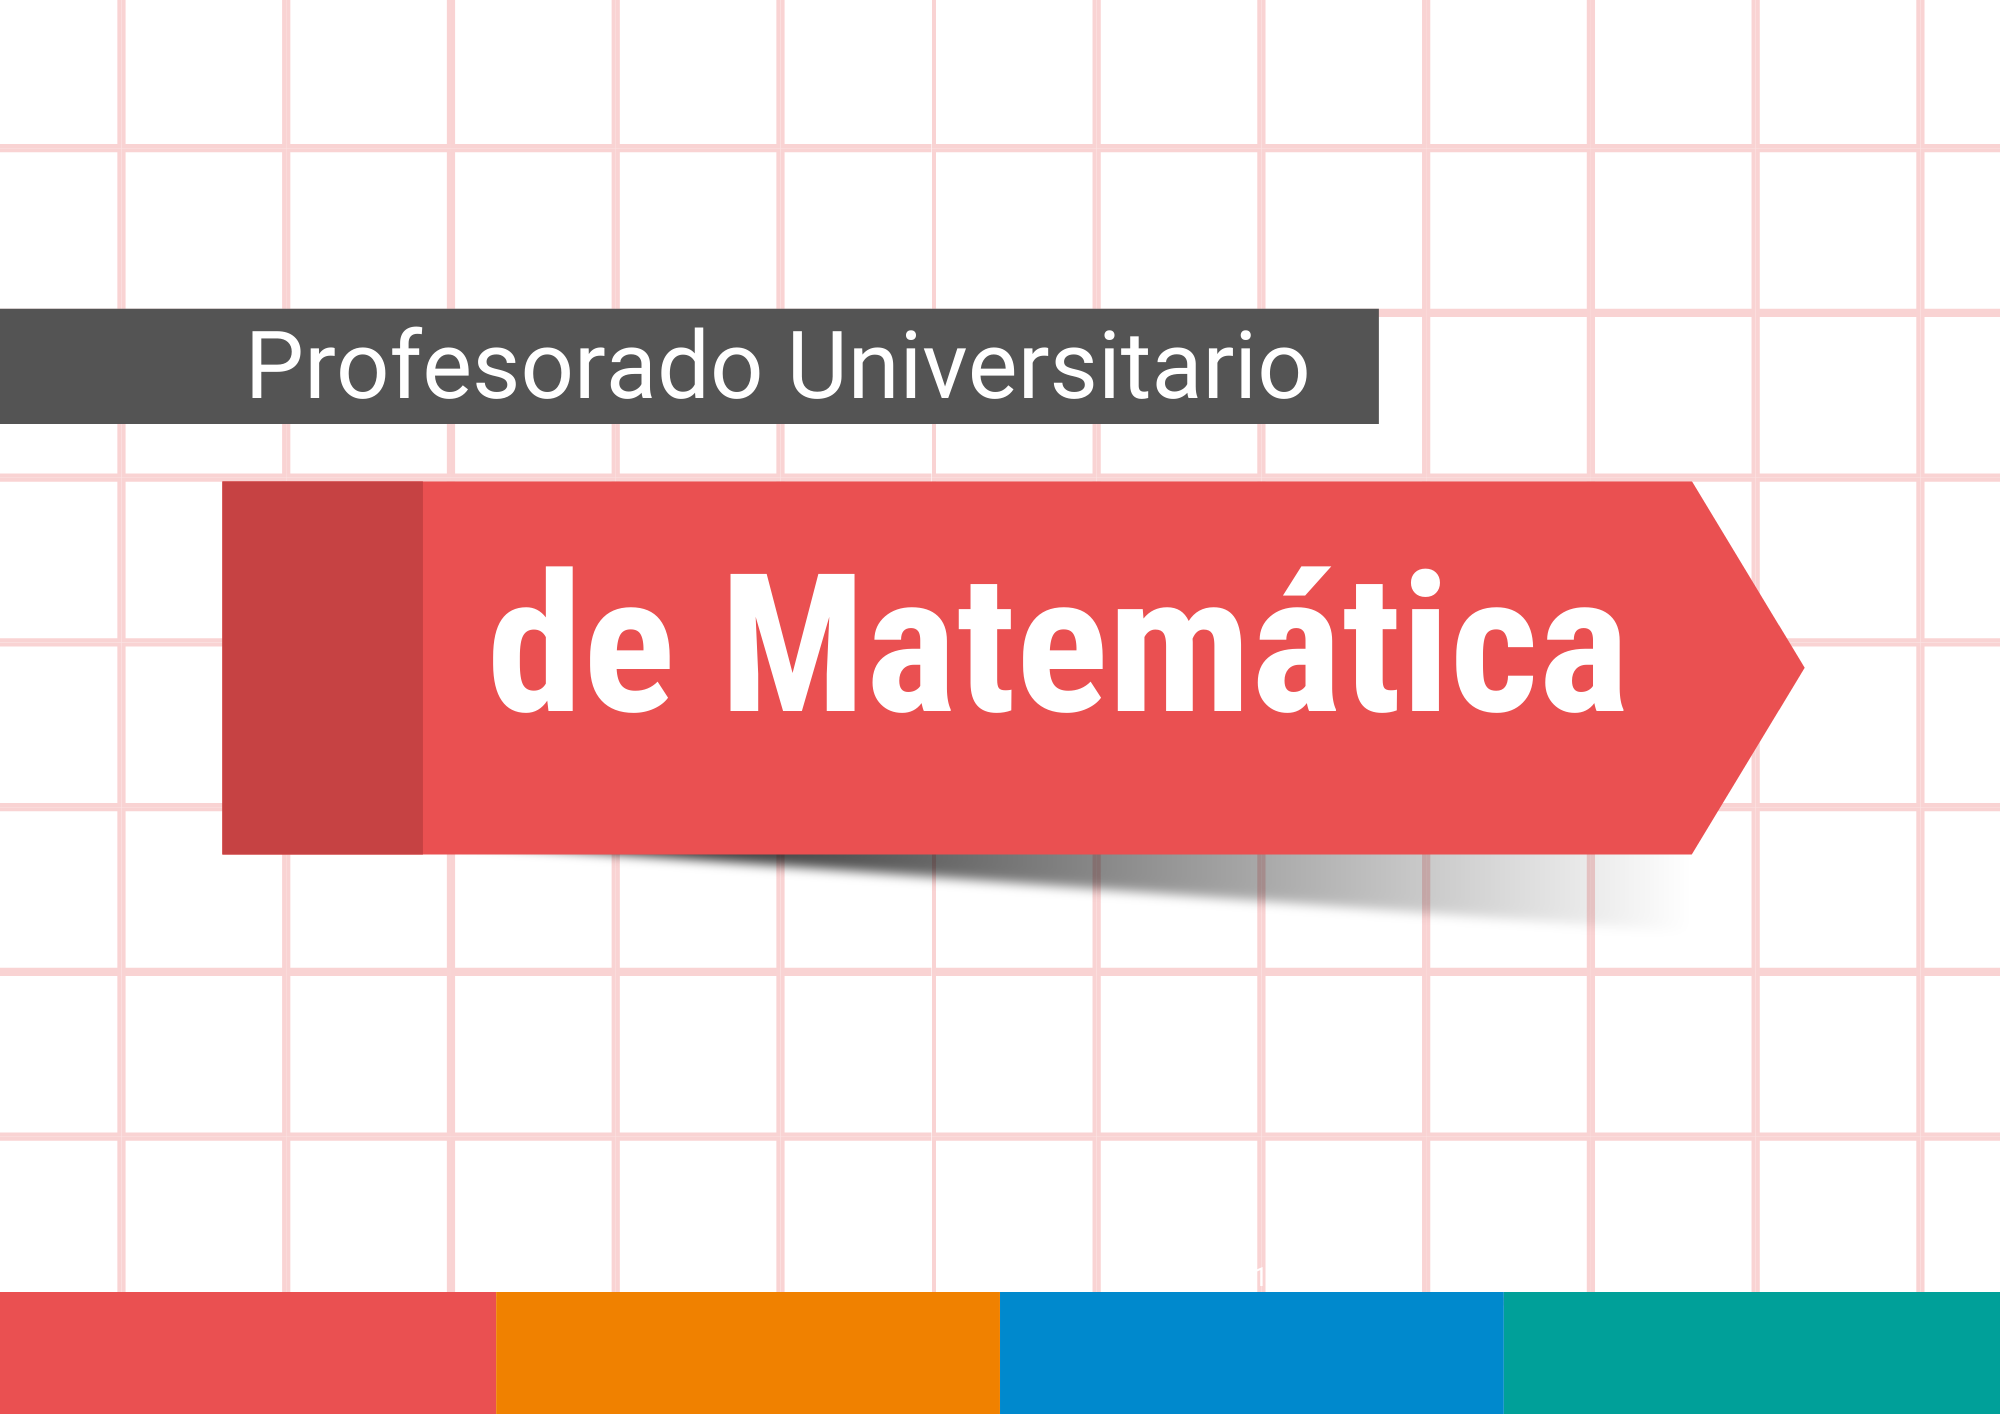 Prof Univ en Matemática